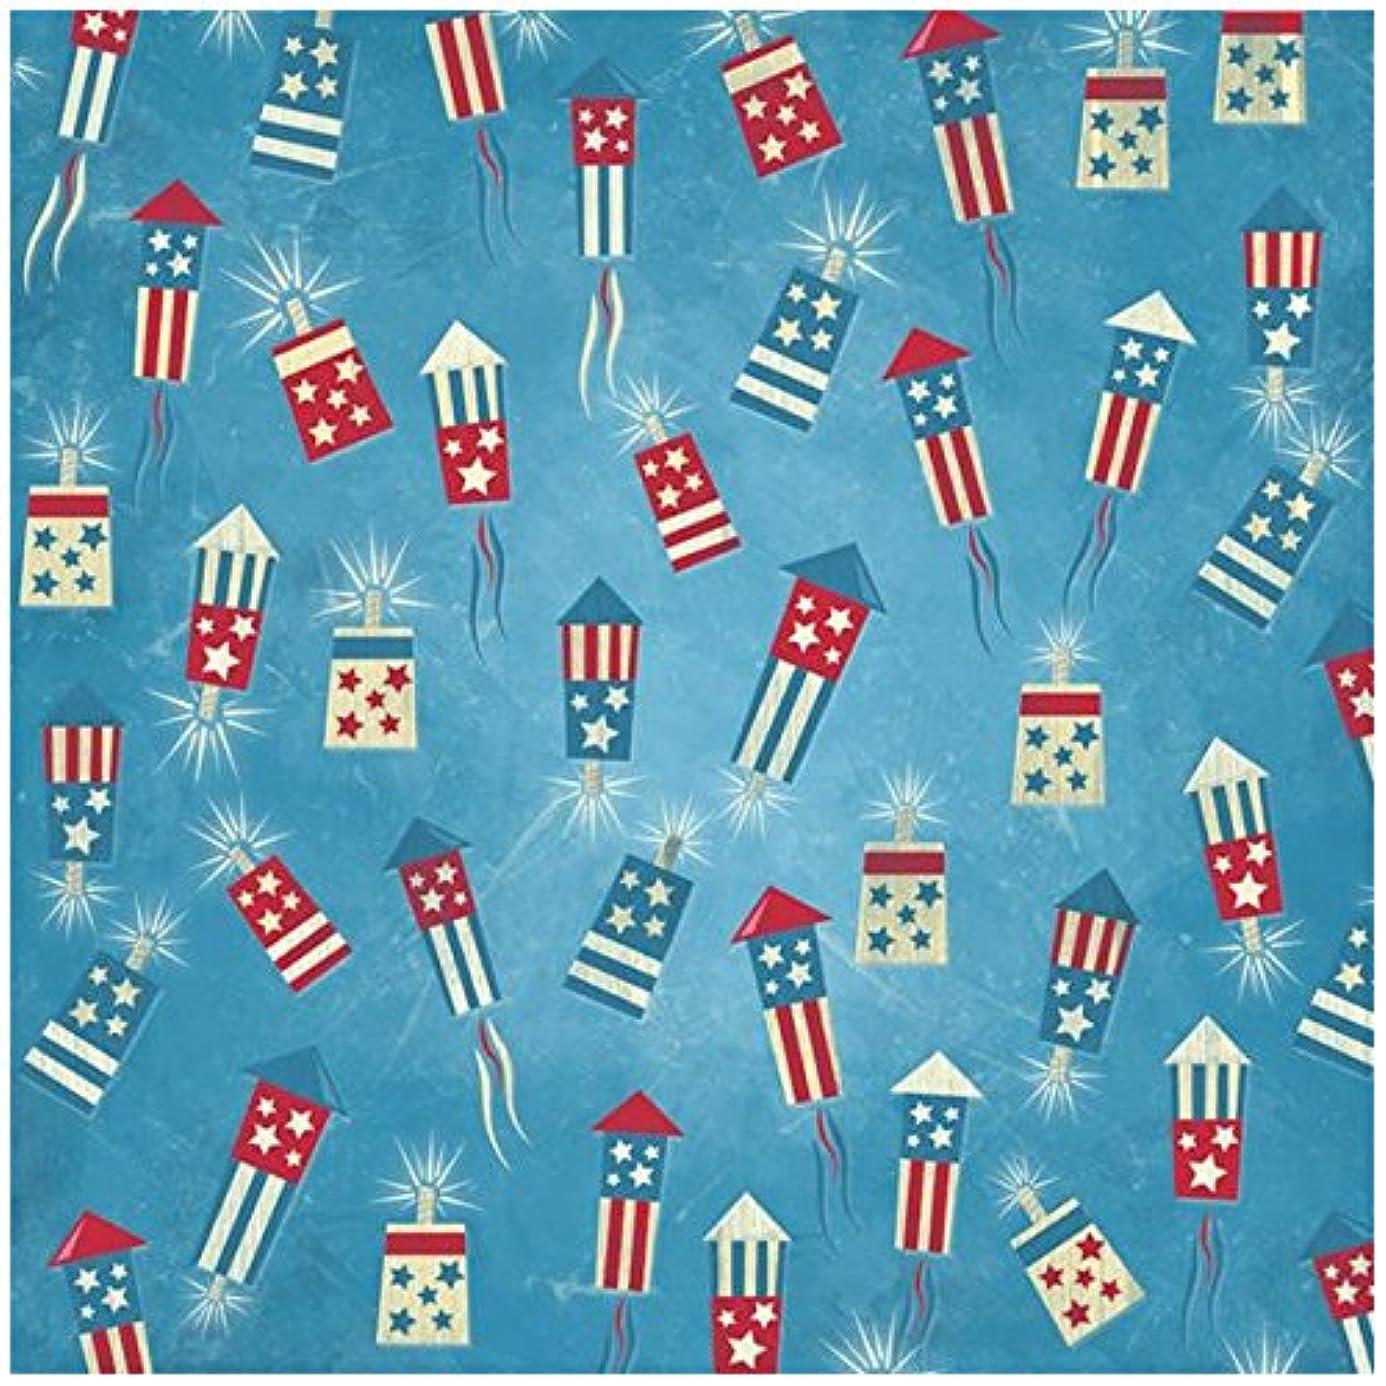 KAREN FOSTER Design Scrapbooking Paper, 25 Sheets, Fireworks Stand, 12 x 12 qso7396068